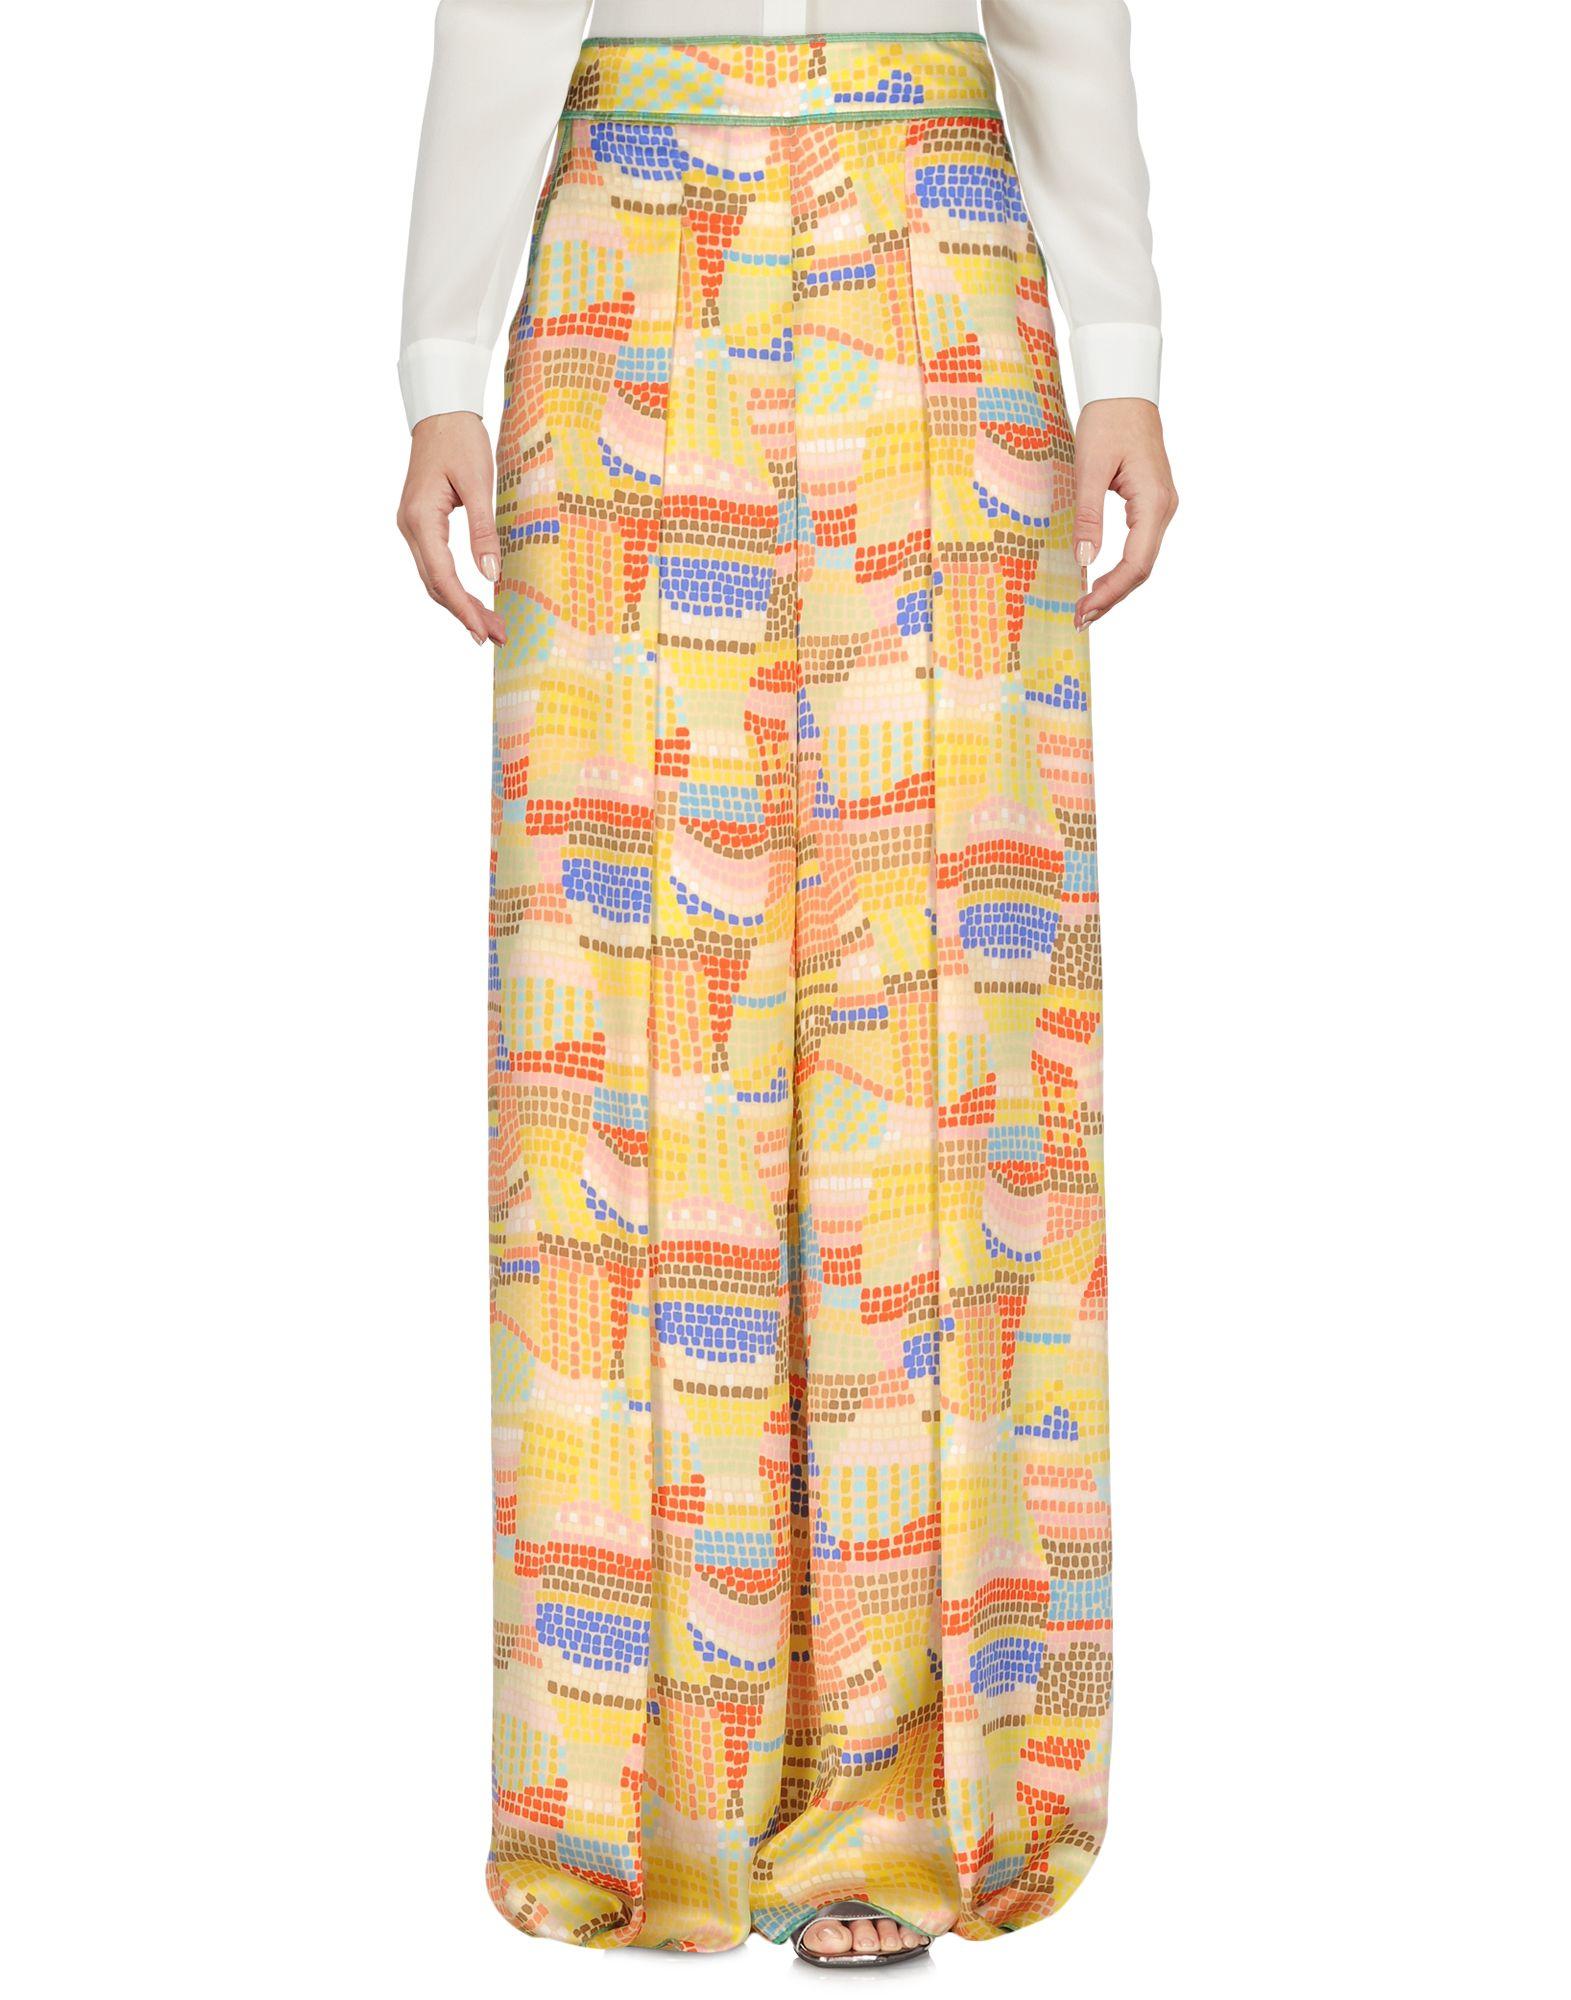 ANITA BASSETTI Damen Hose Farbe Gelb Größe 3